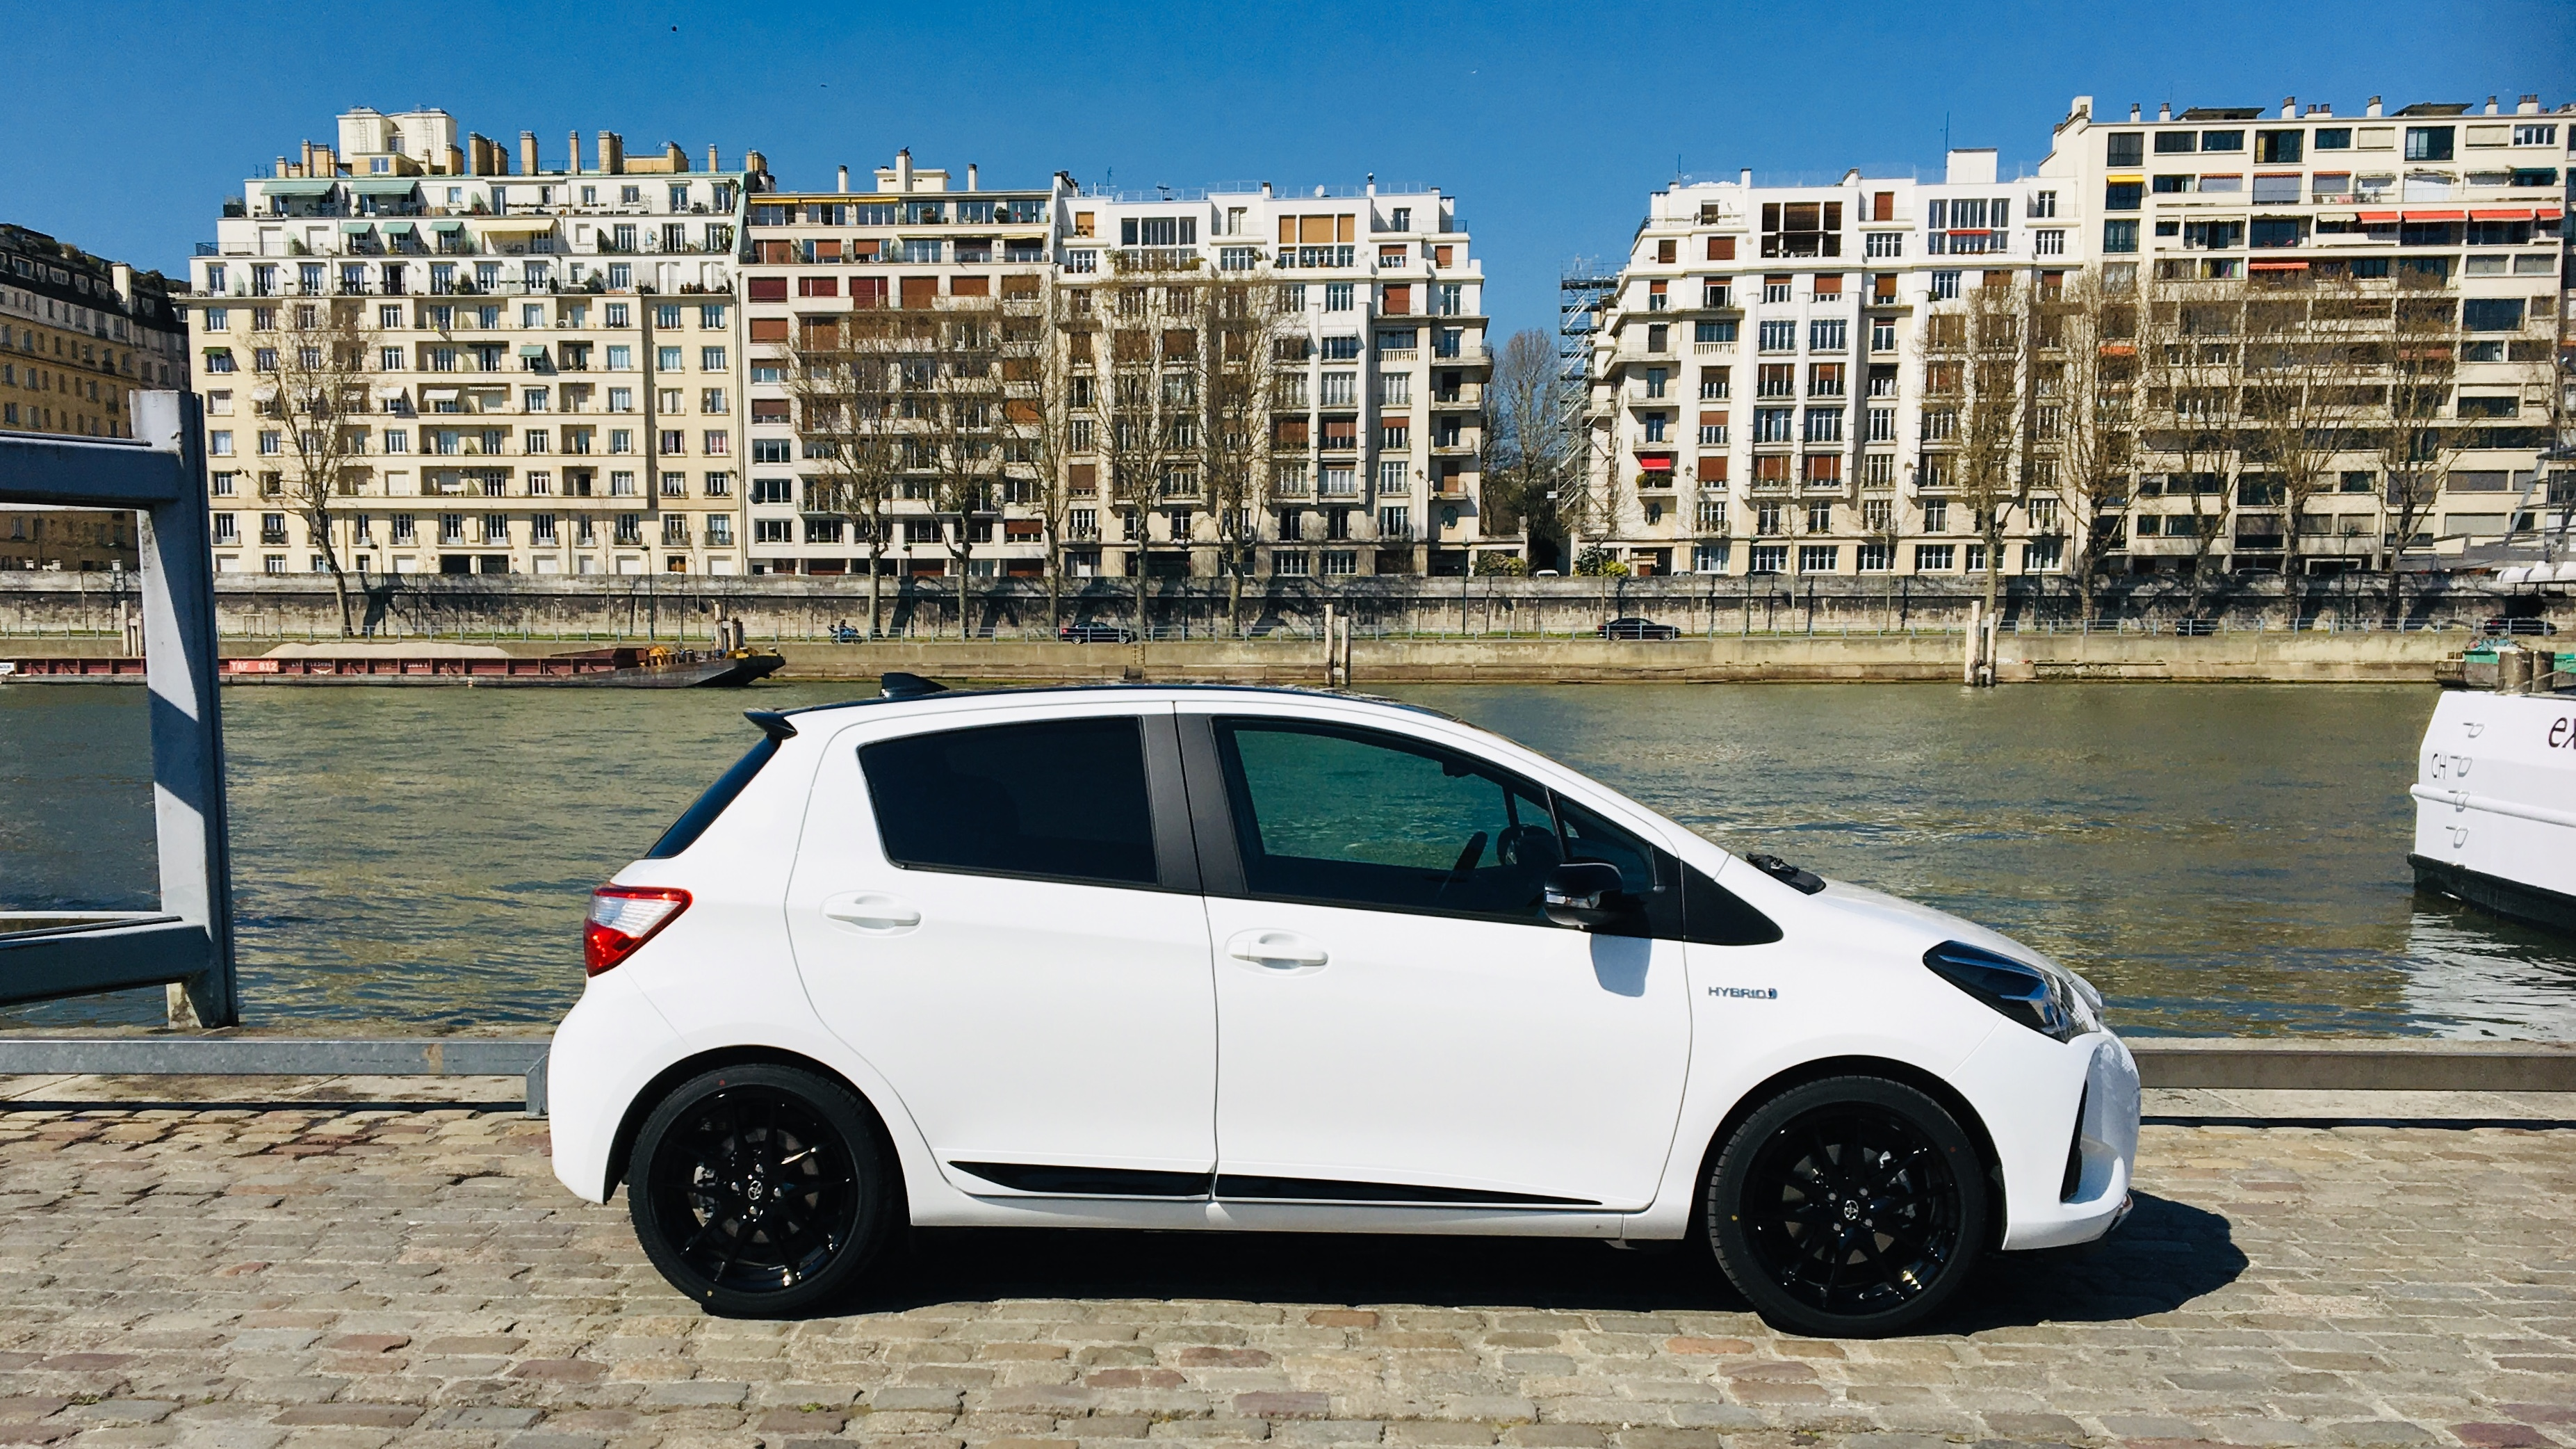 Essai \u2013 Toyota Yaris GR Sport  un plaisir de conduite différent